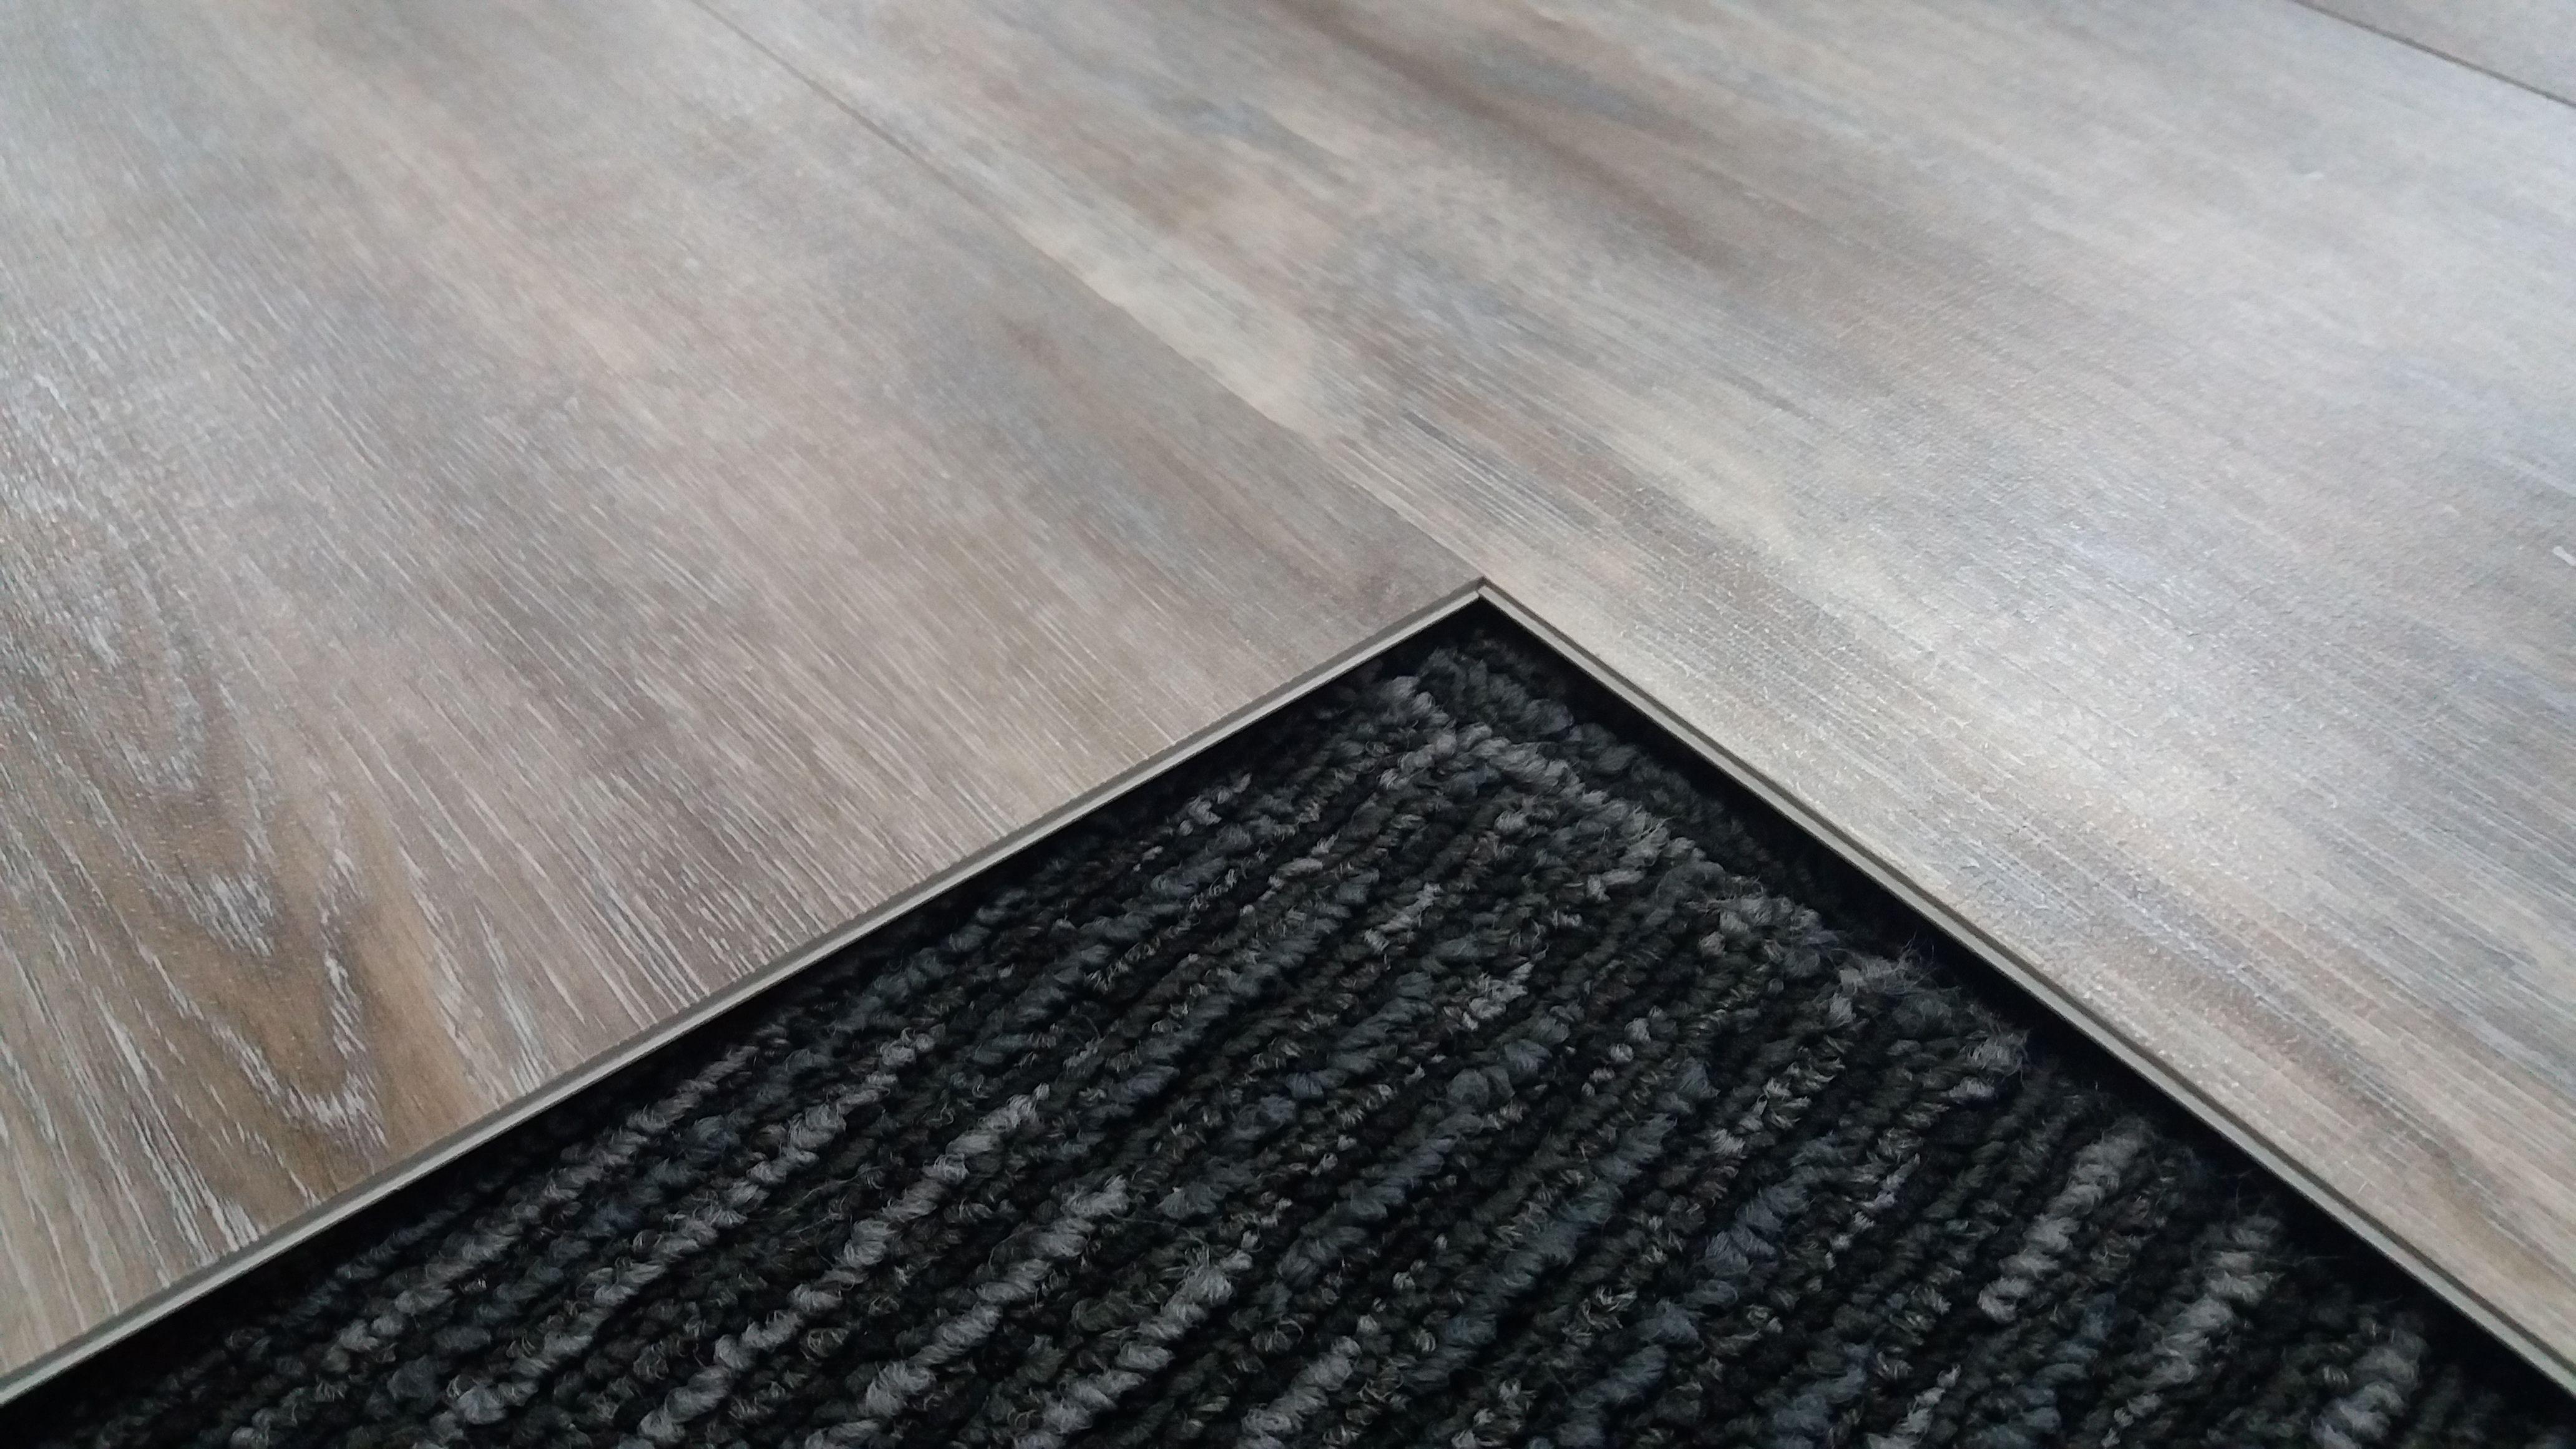 Spc Flooring Stands For Stone Plastic Composite And Decno S Spc Floor Diamo Is Designed To Exceed The Mai Vinyl Flooring Waterproof Flooring Vinyls Flooring